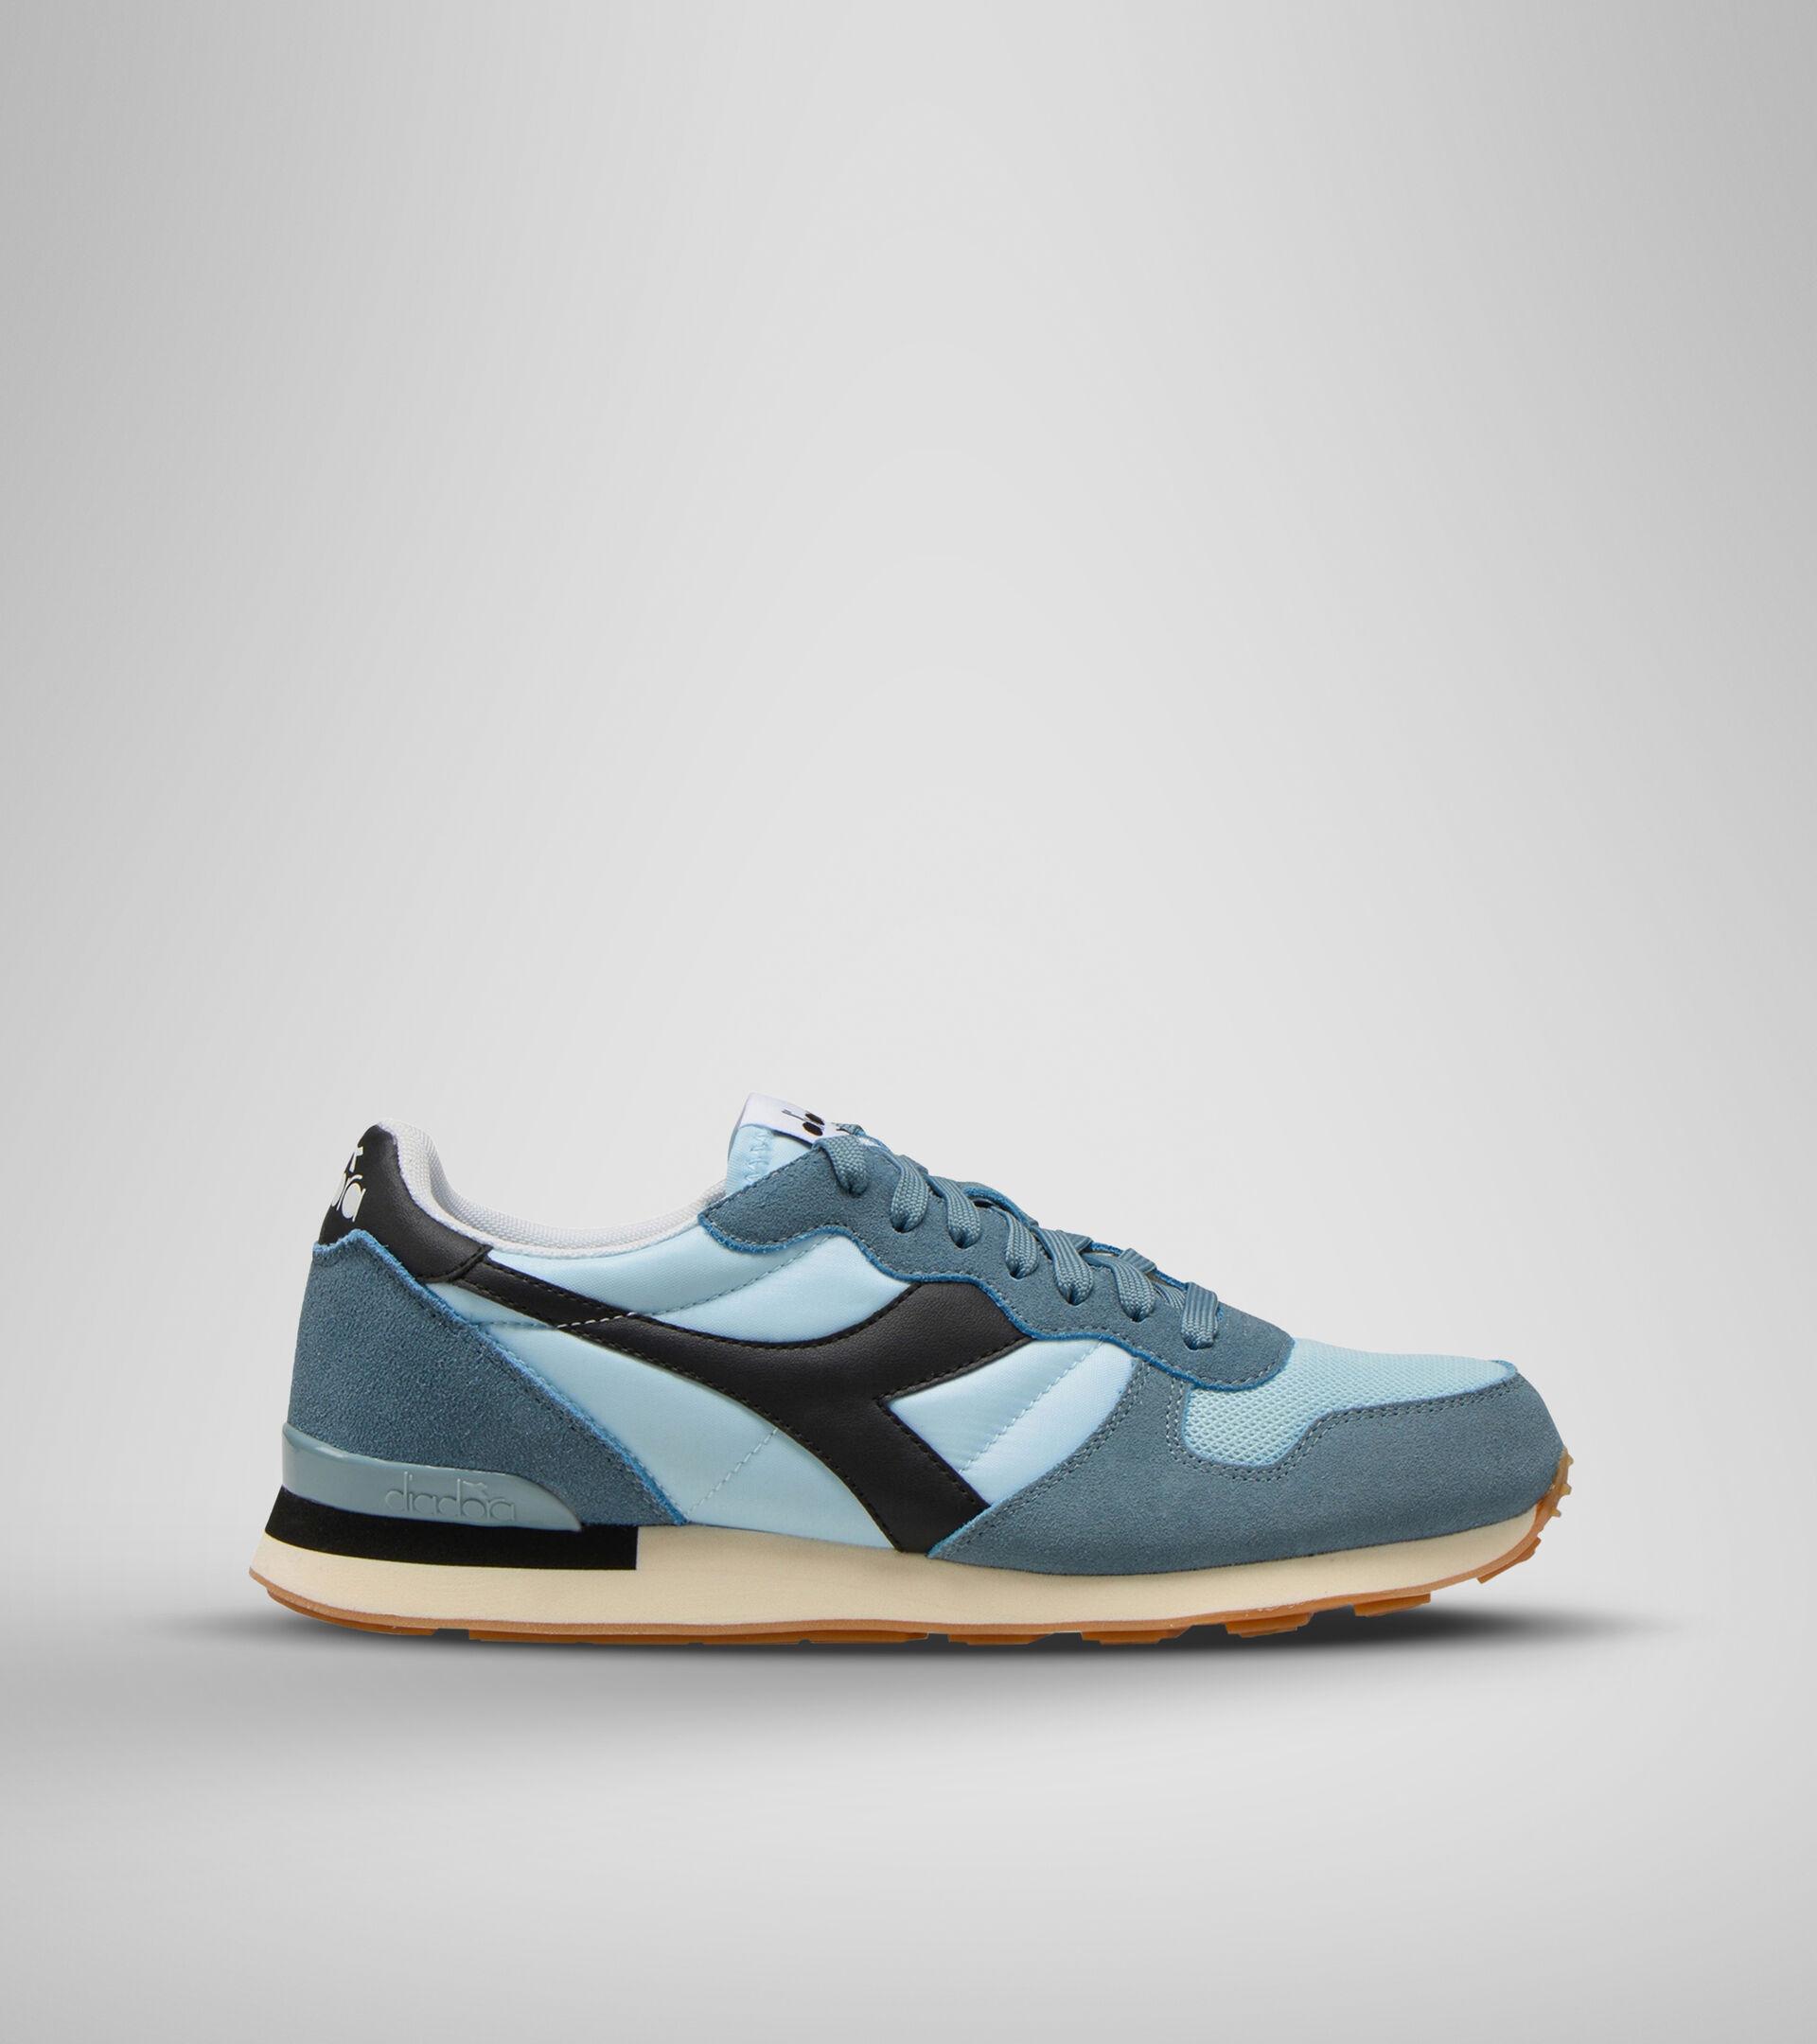 Footwear Sportswear UNISEX CAMARO GRIS ARONA/AZL LUZ DE ESTRELLA Diadora